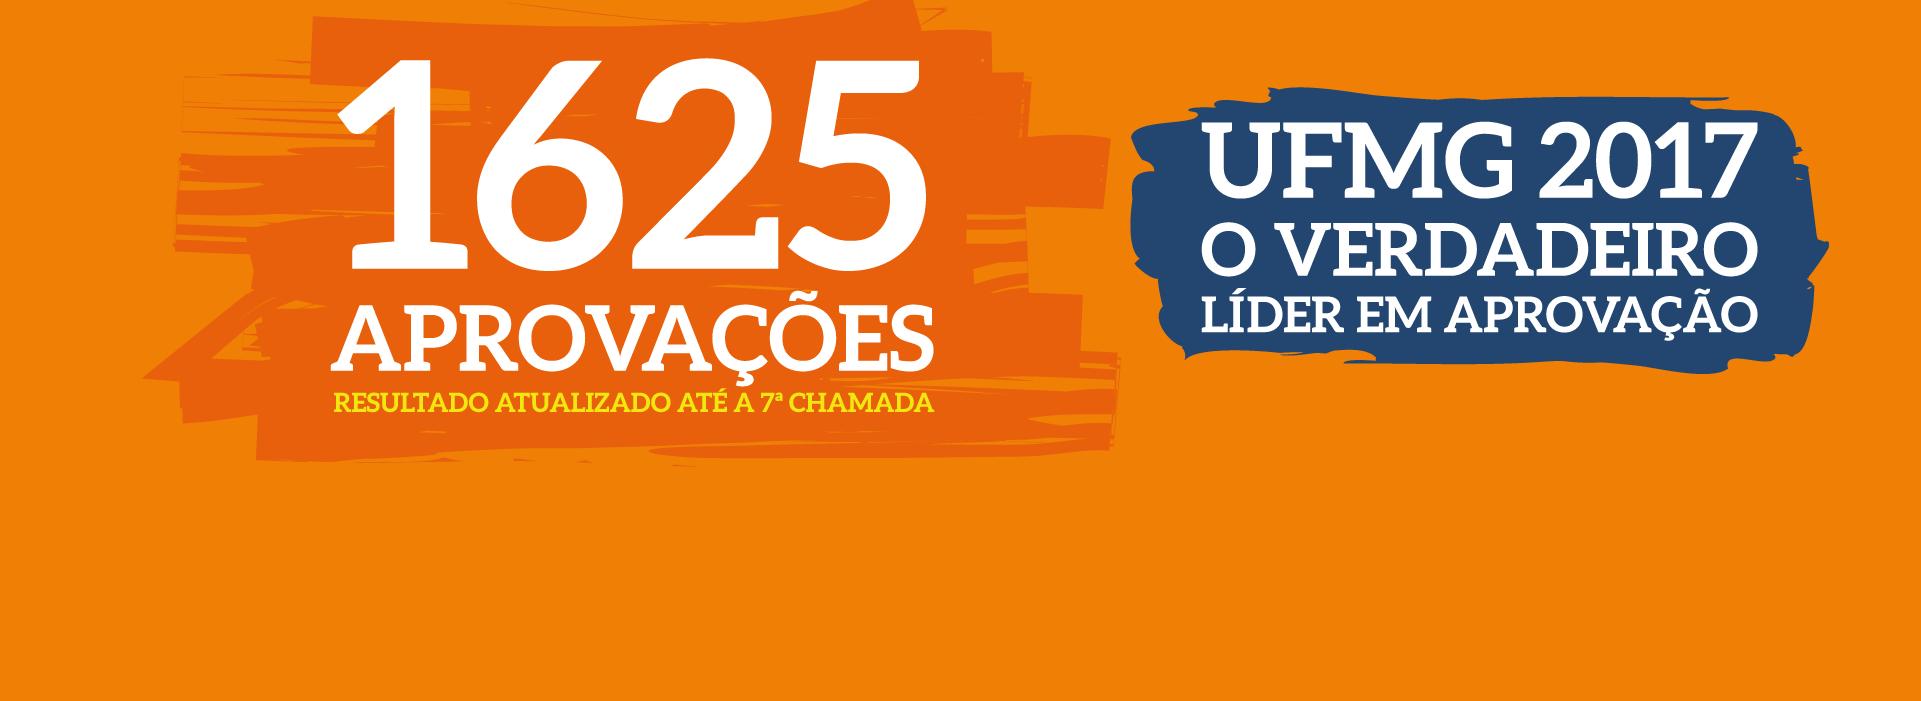 Capa - Lista de Aprovados UFMG 2017-01